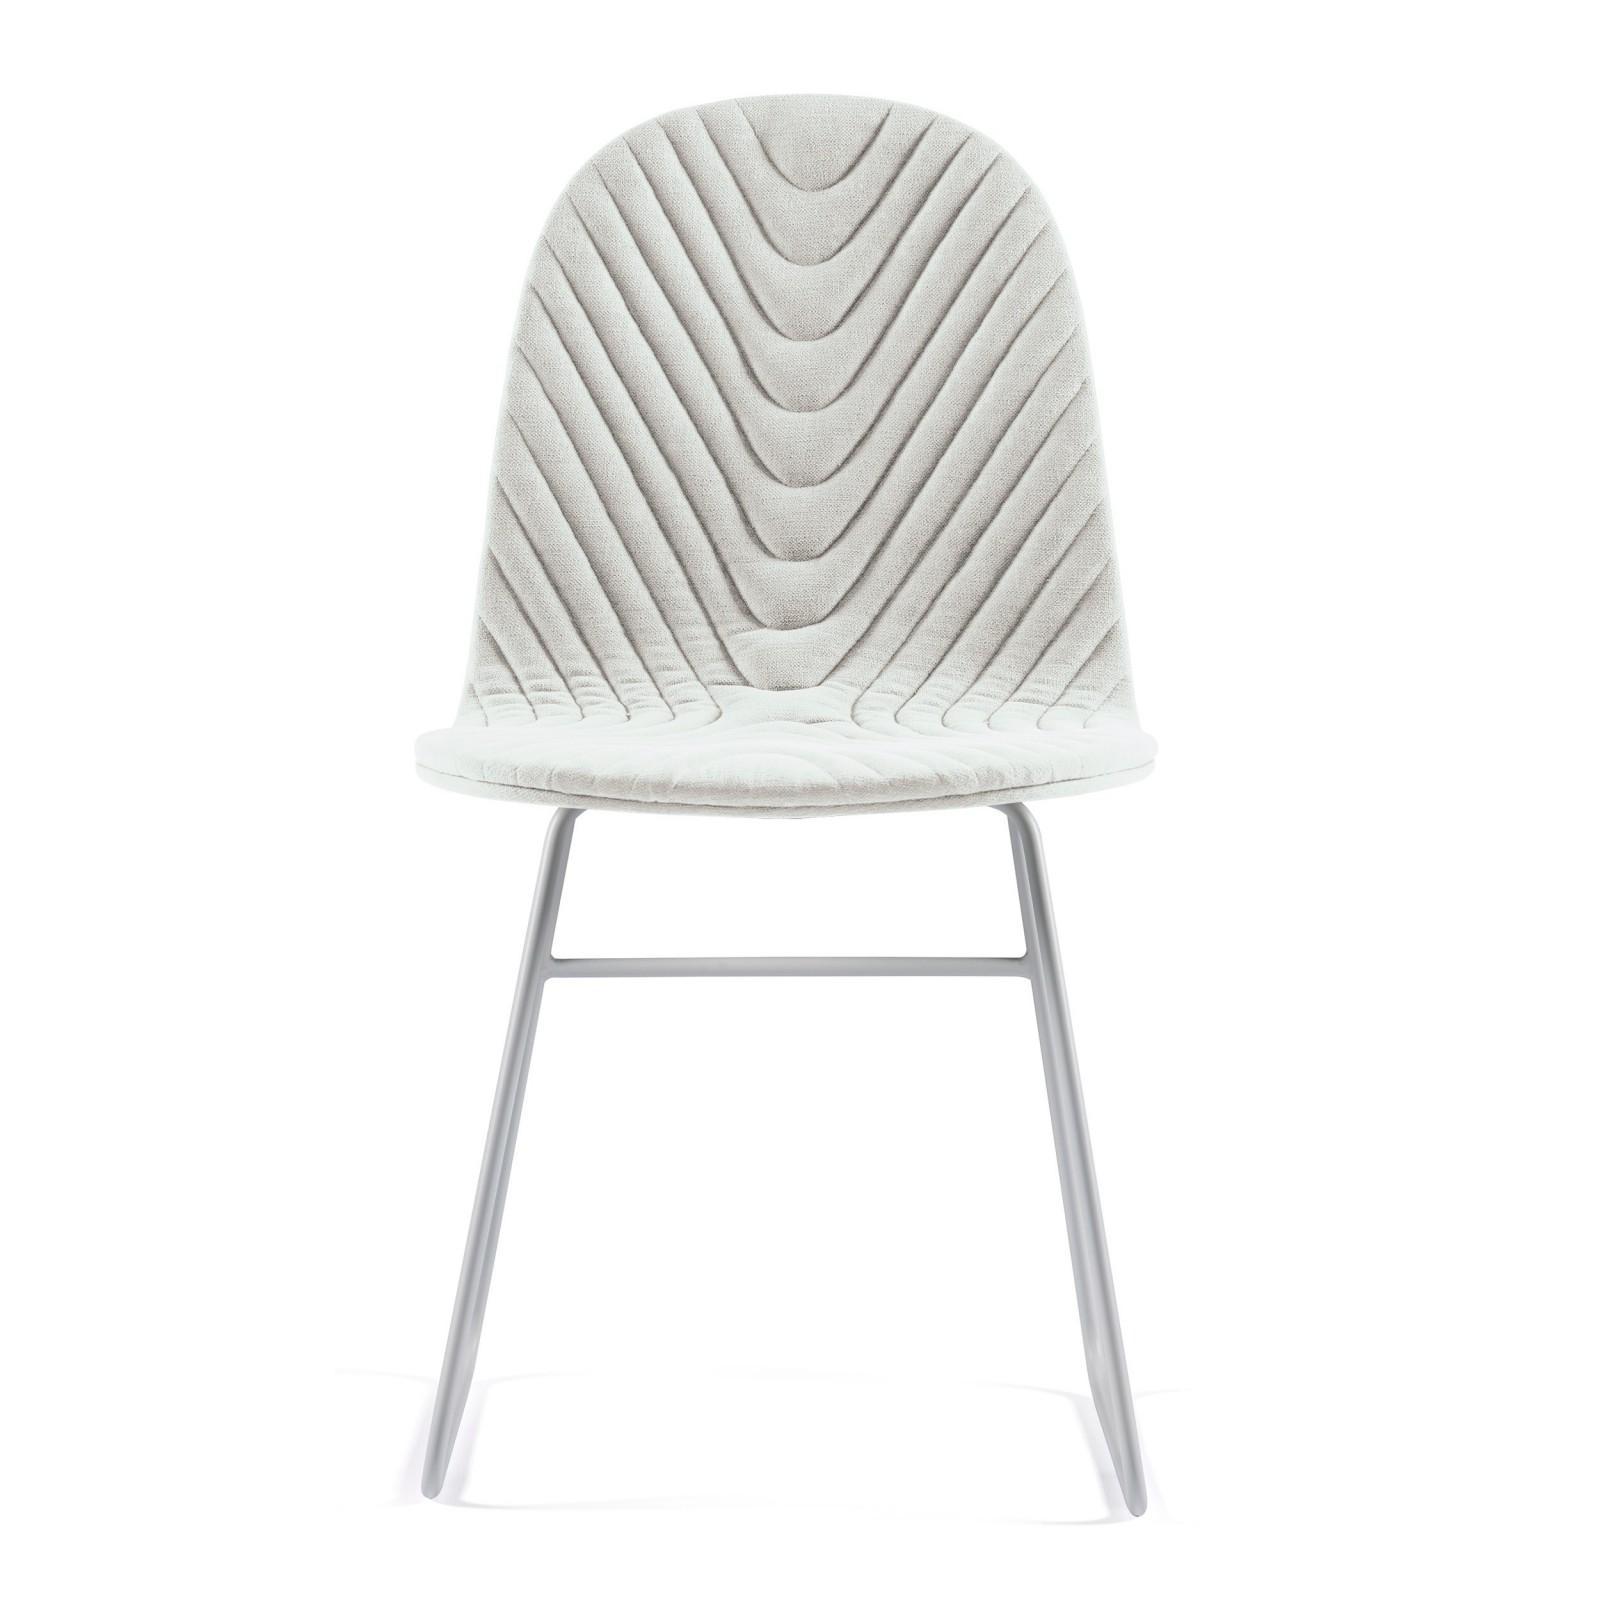 Krzesło Mannequin - 02 - ecru